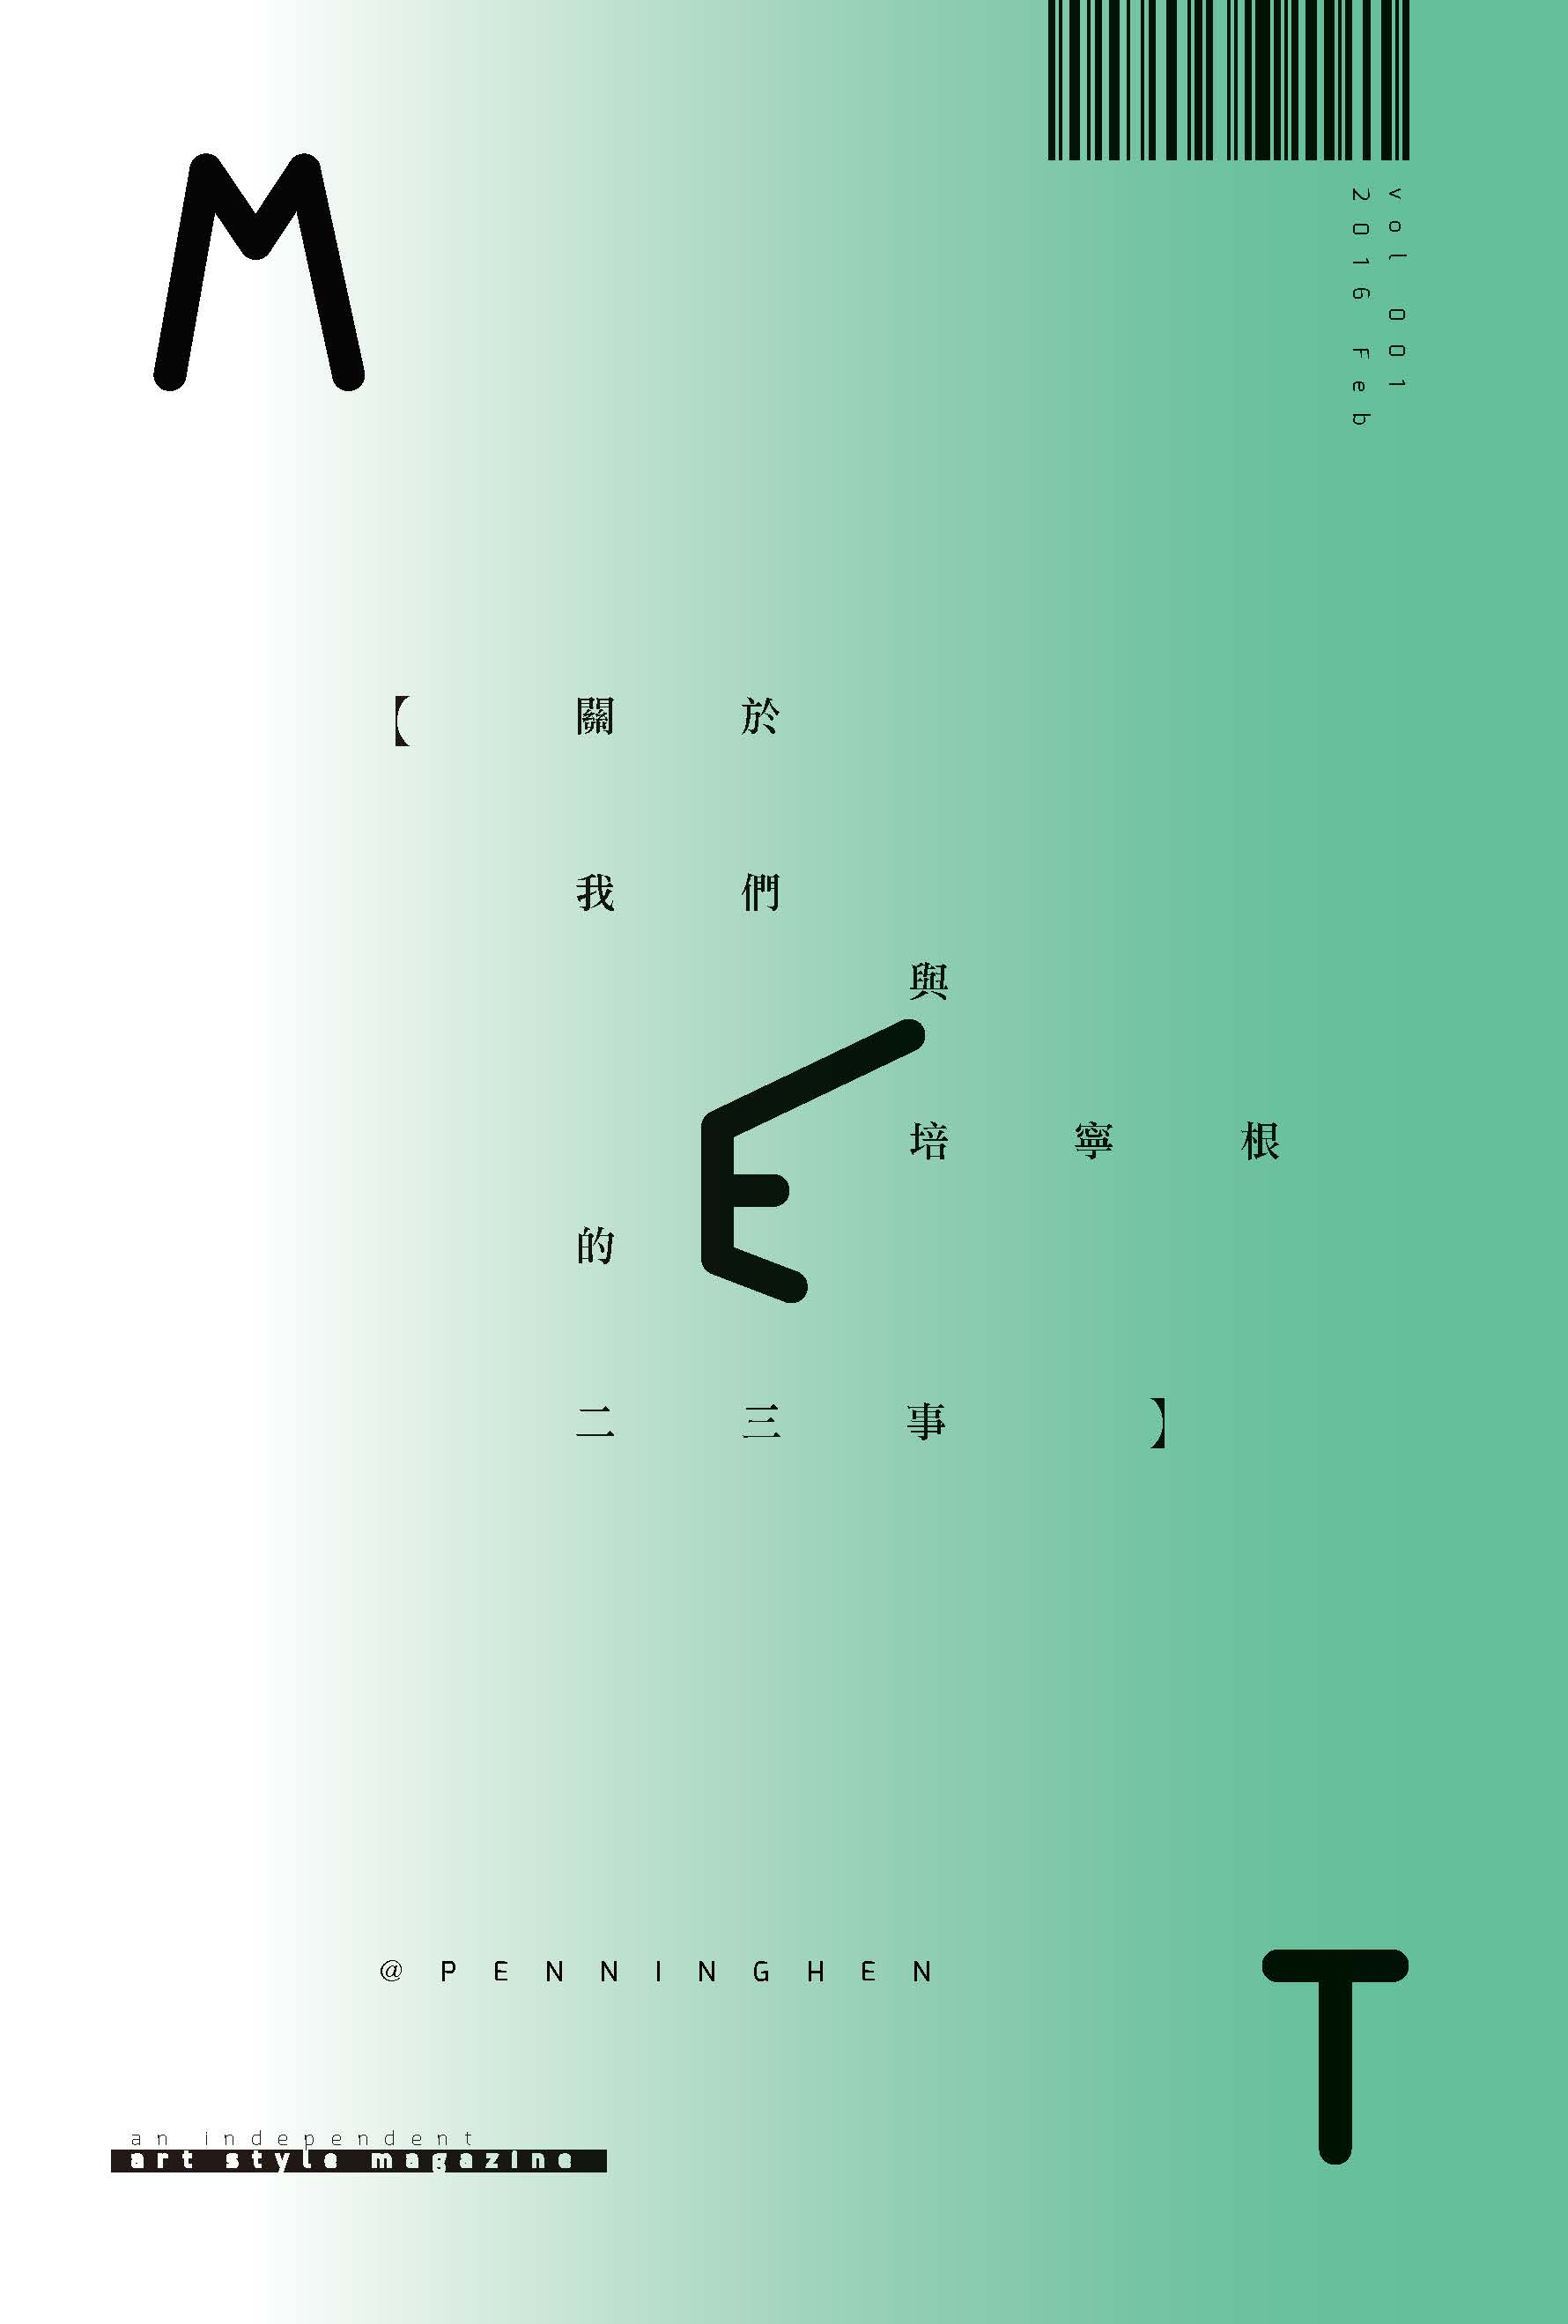 MET - edition / illustration